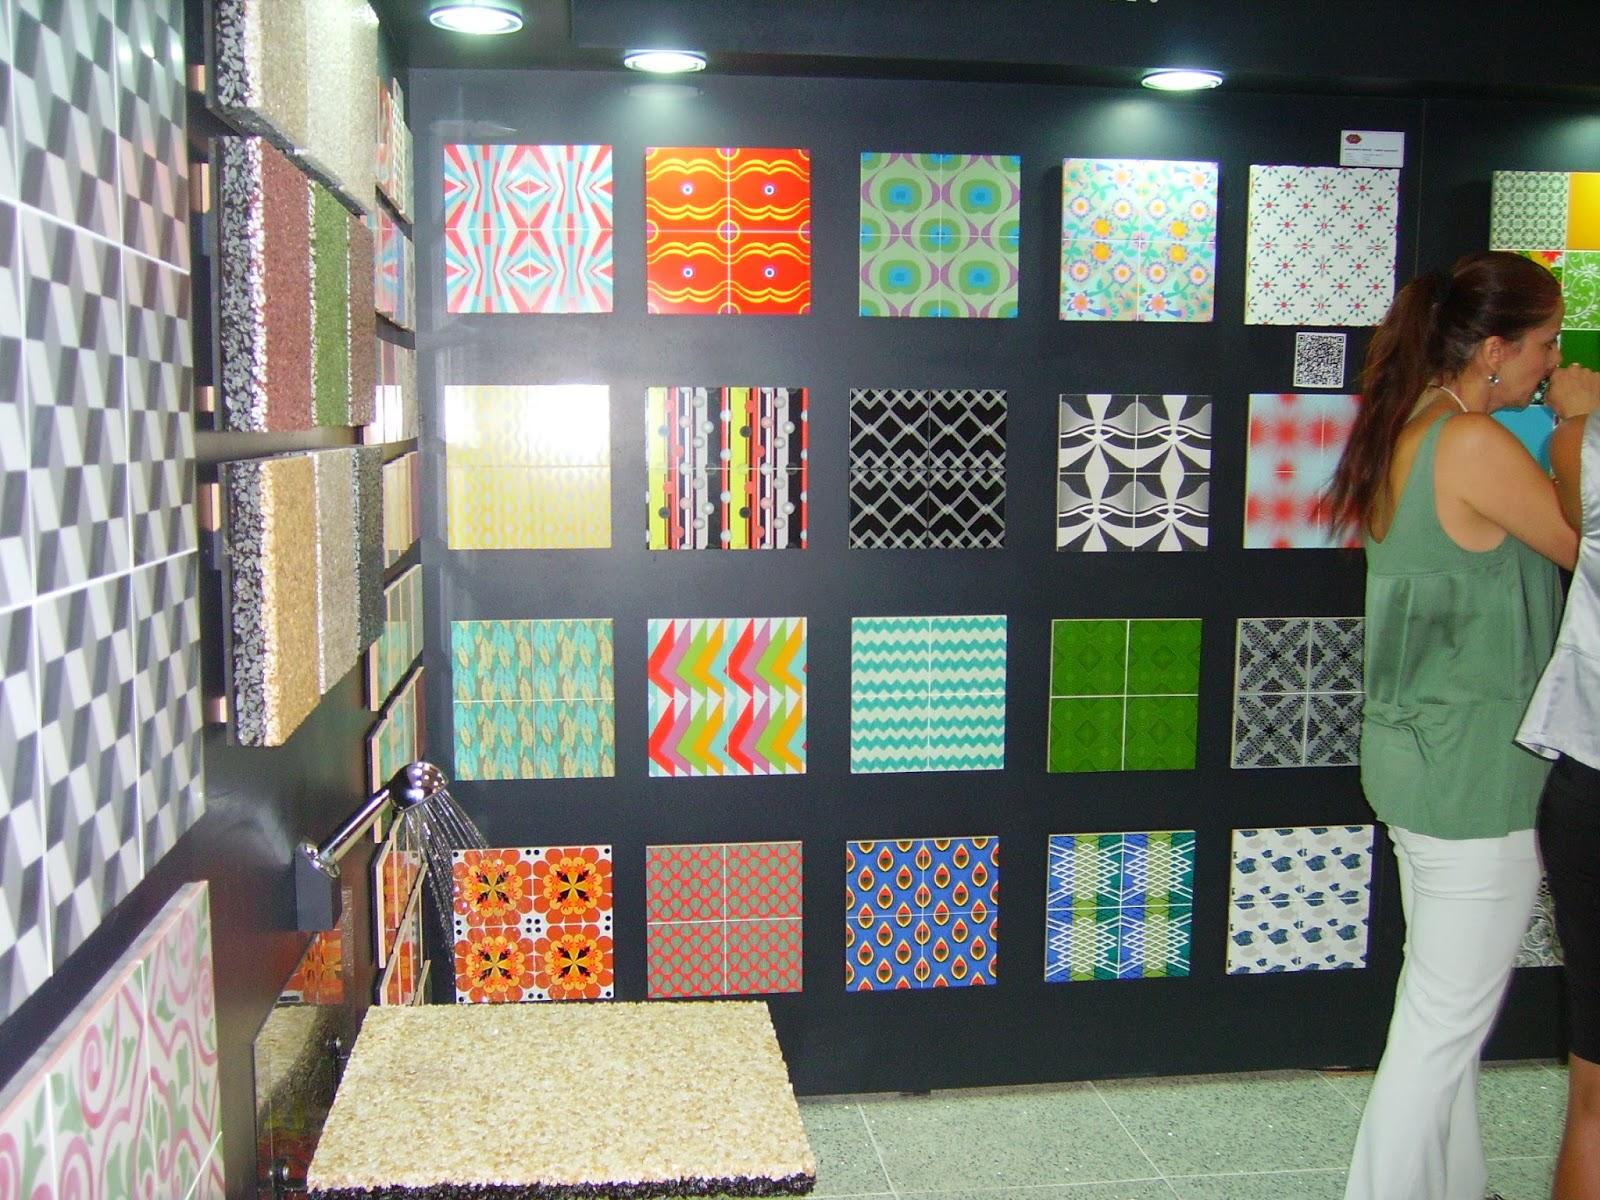 foto 1 - Expo Revestir 2012